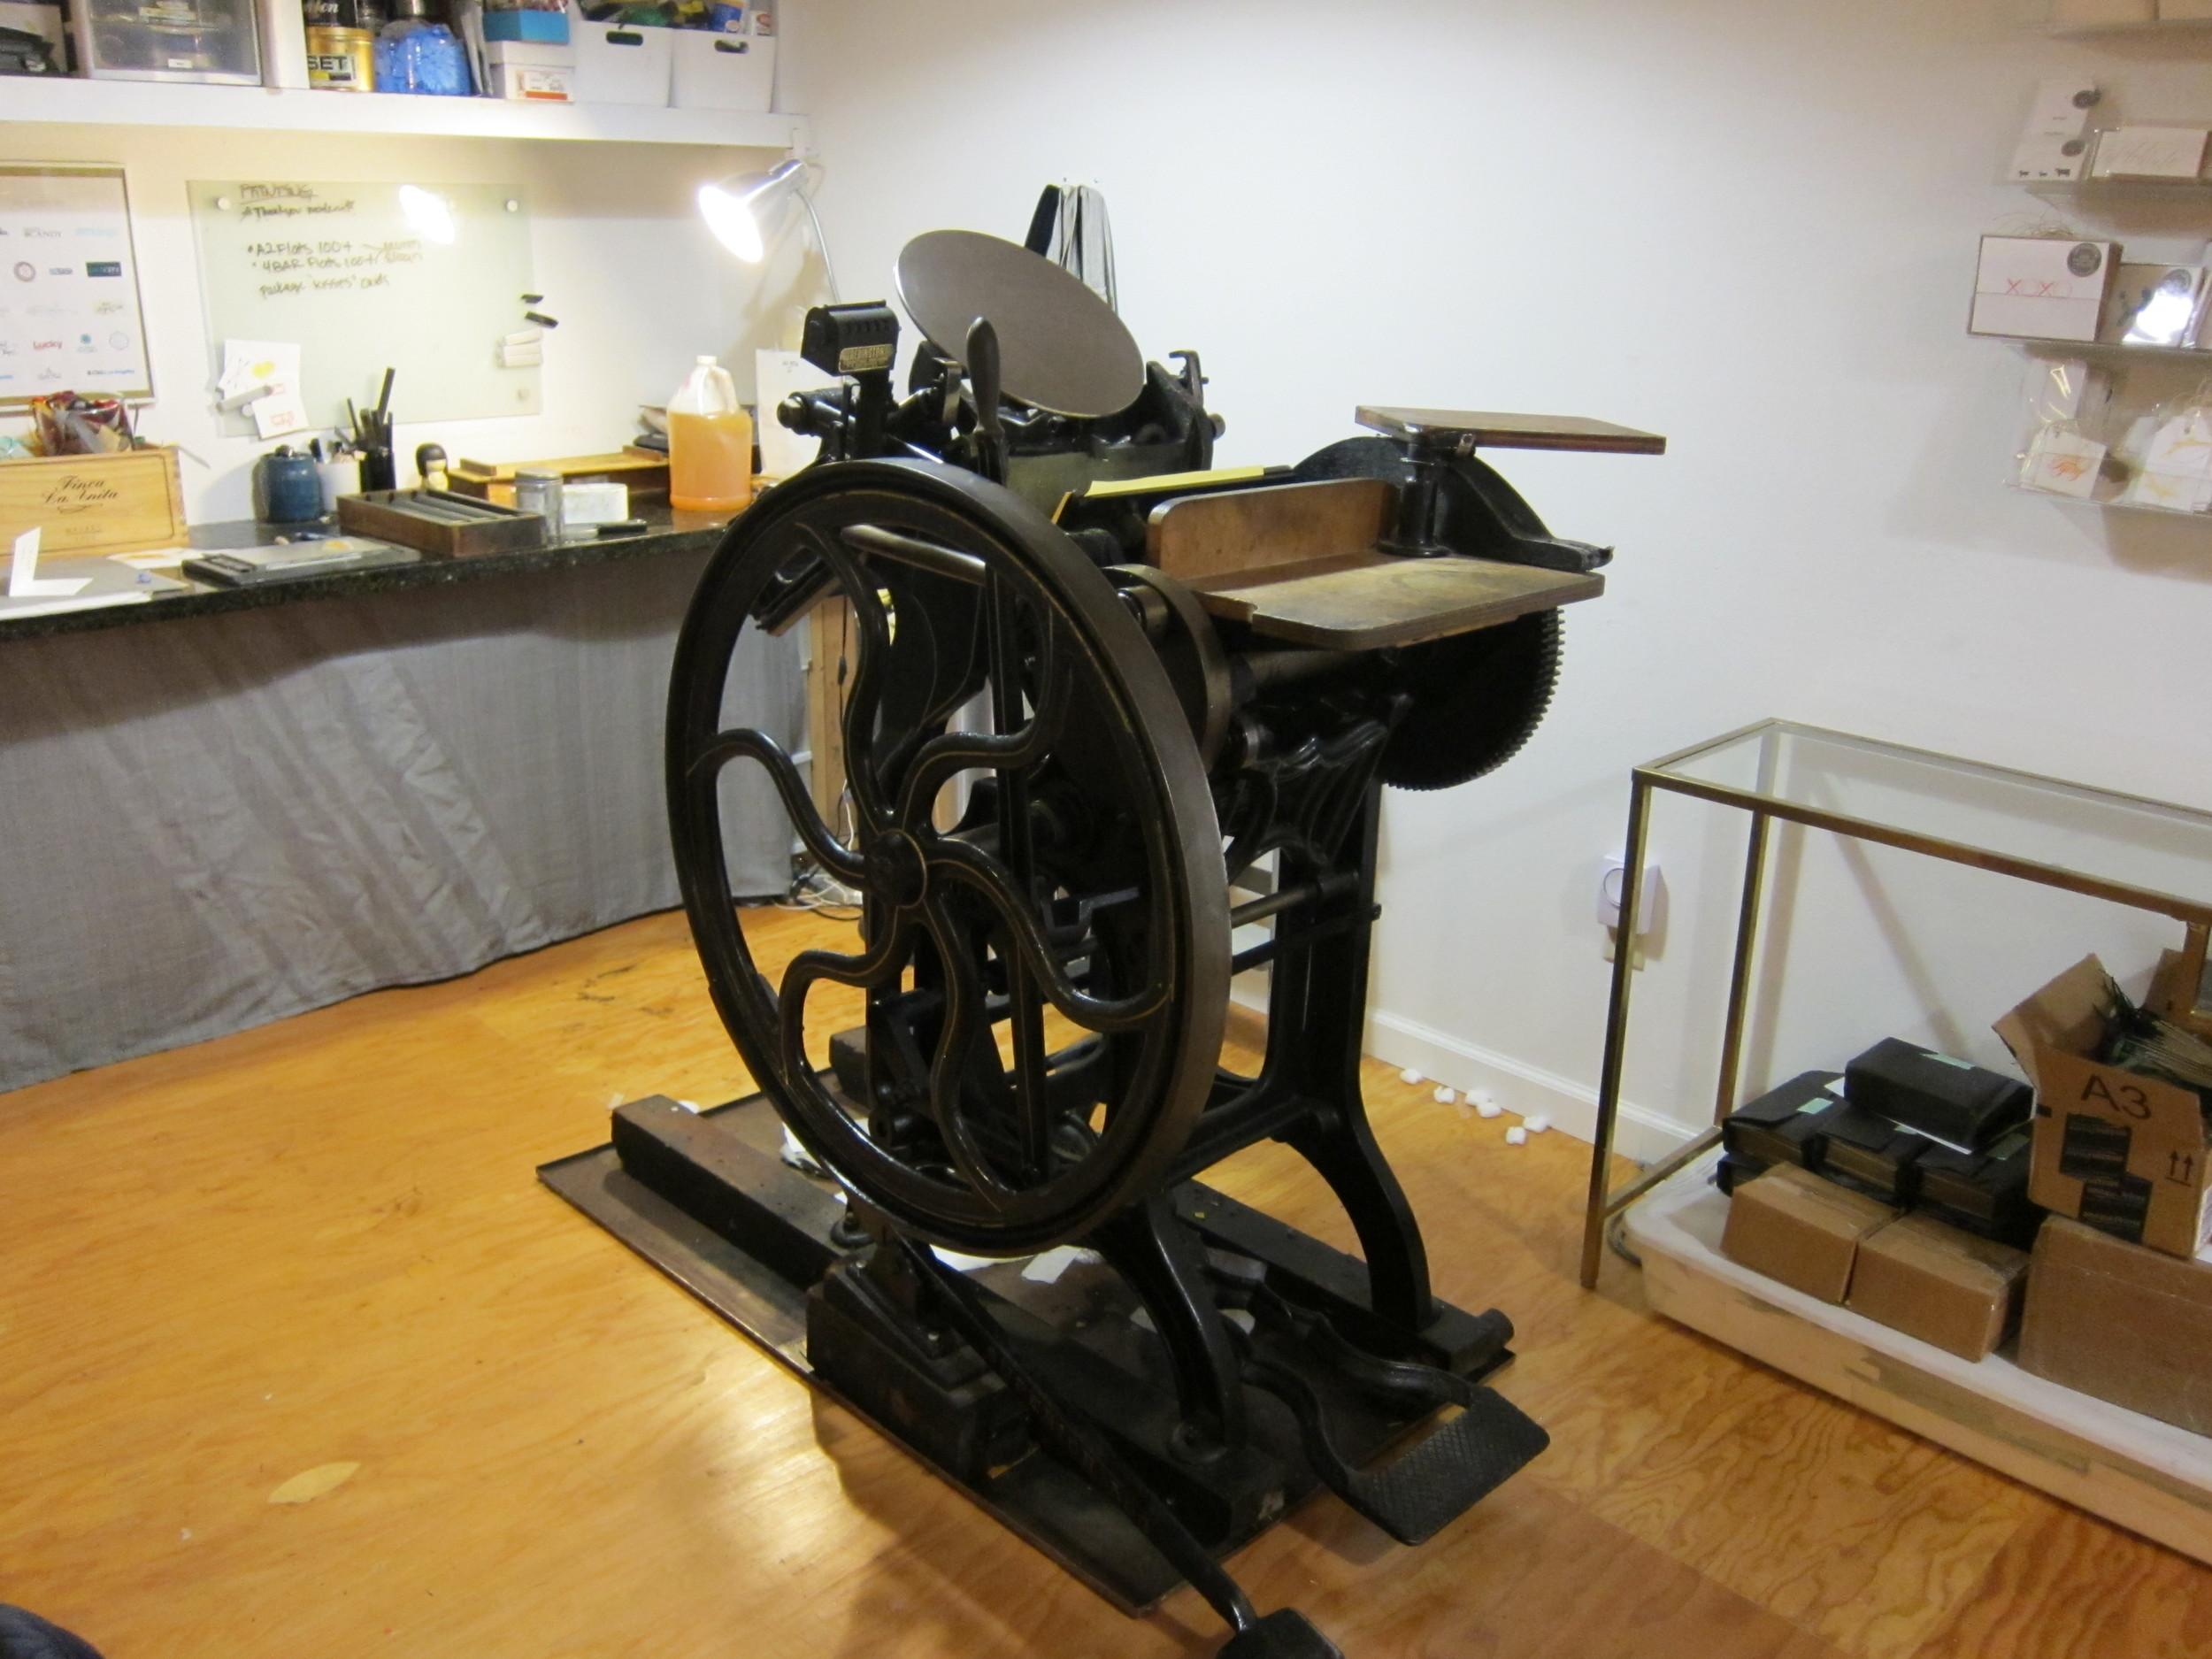 Peach the printing press!